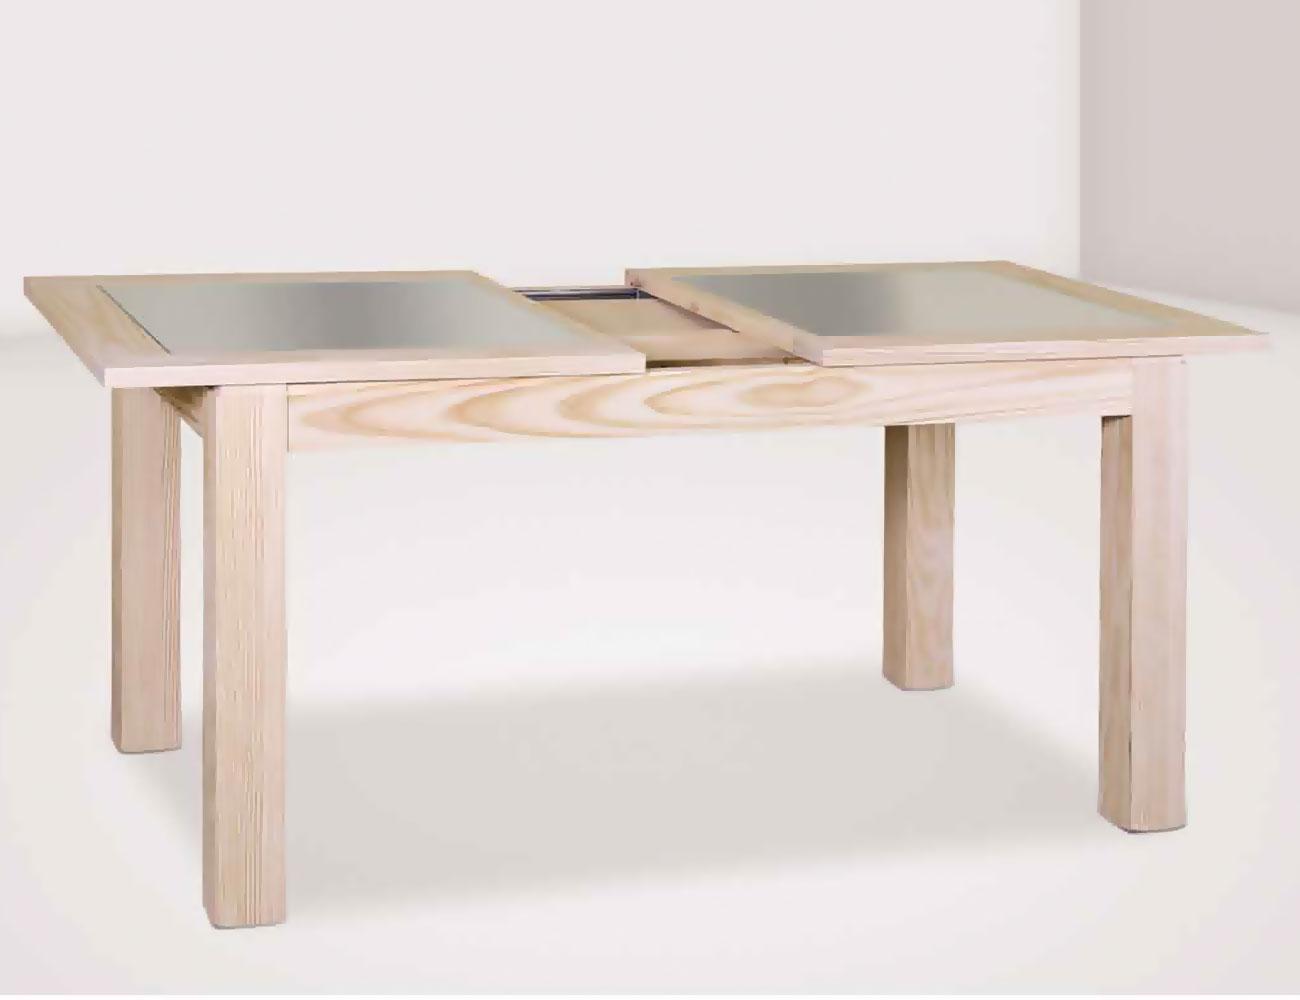 Mesa comedor fija 140 cm en madera con tapa cristal en for Mesa comedor cristal y madera